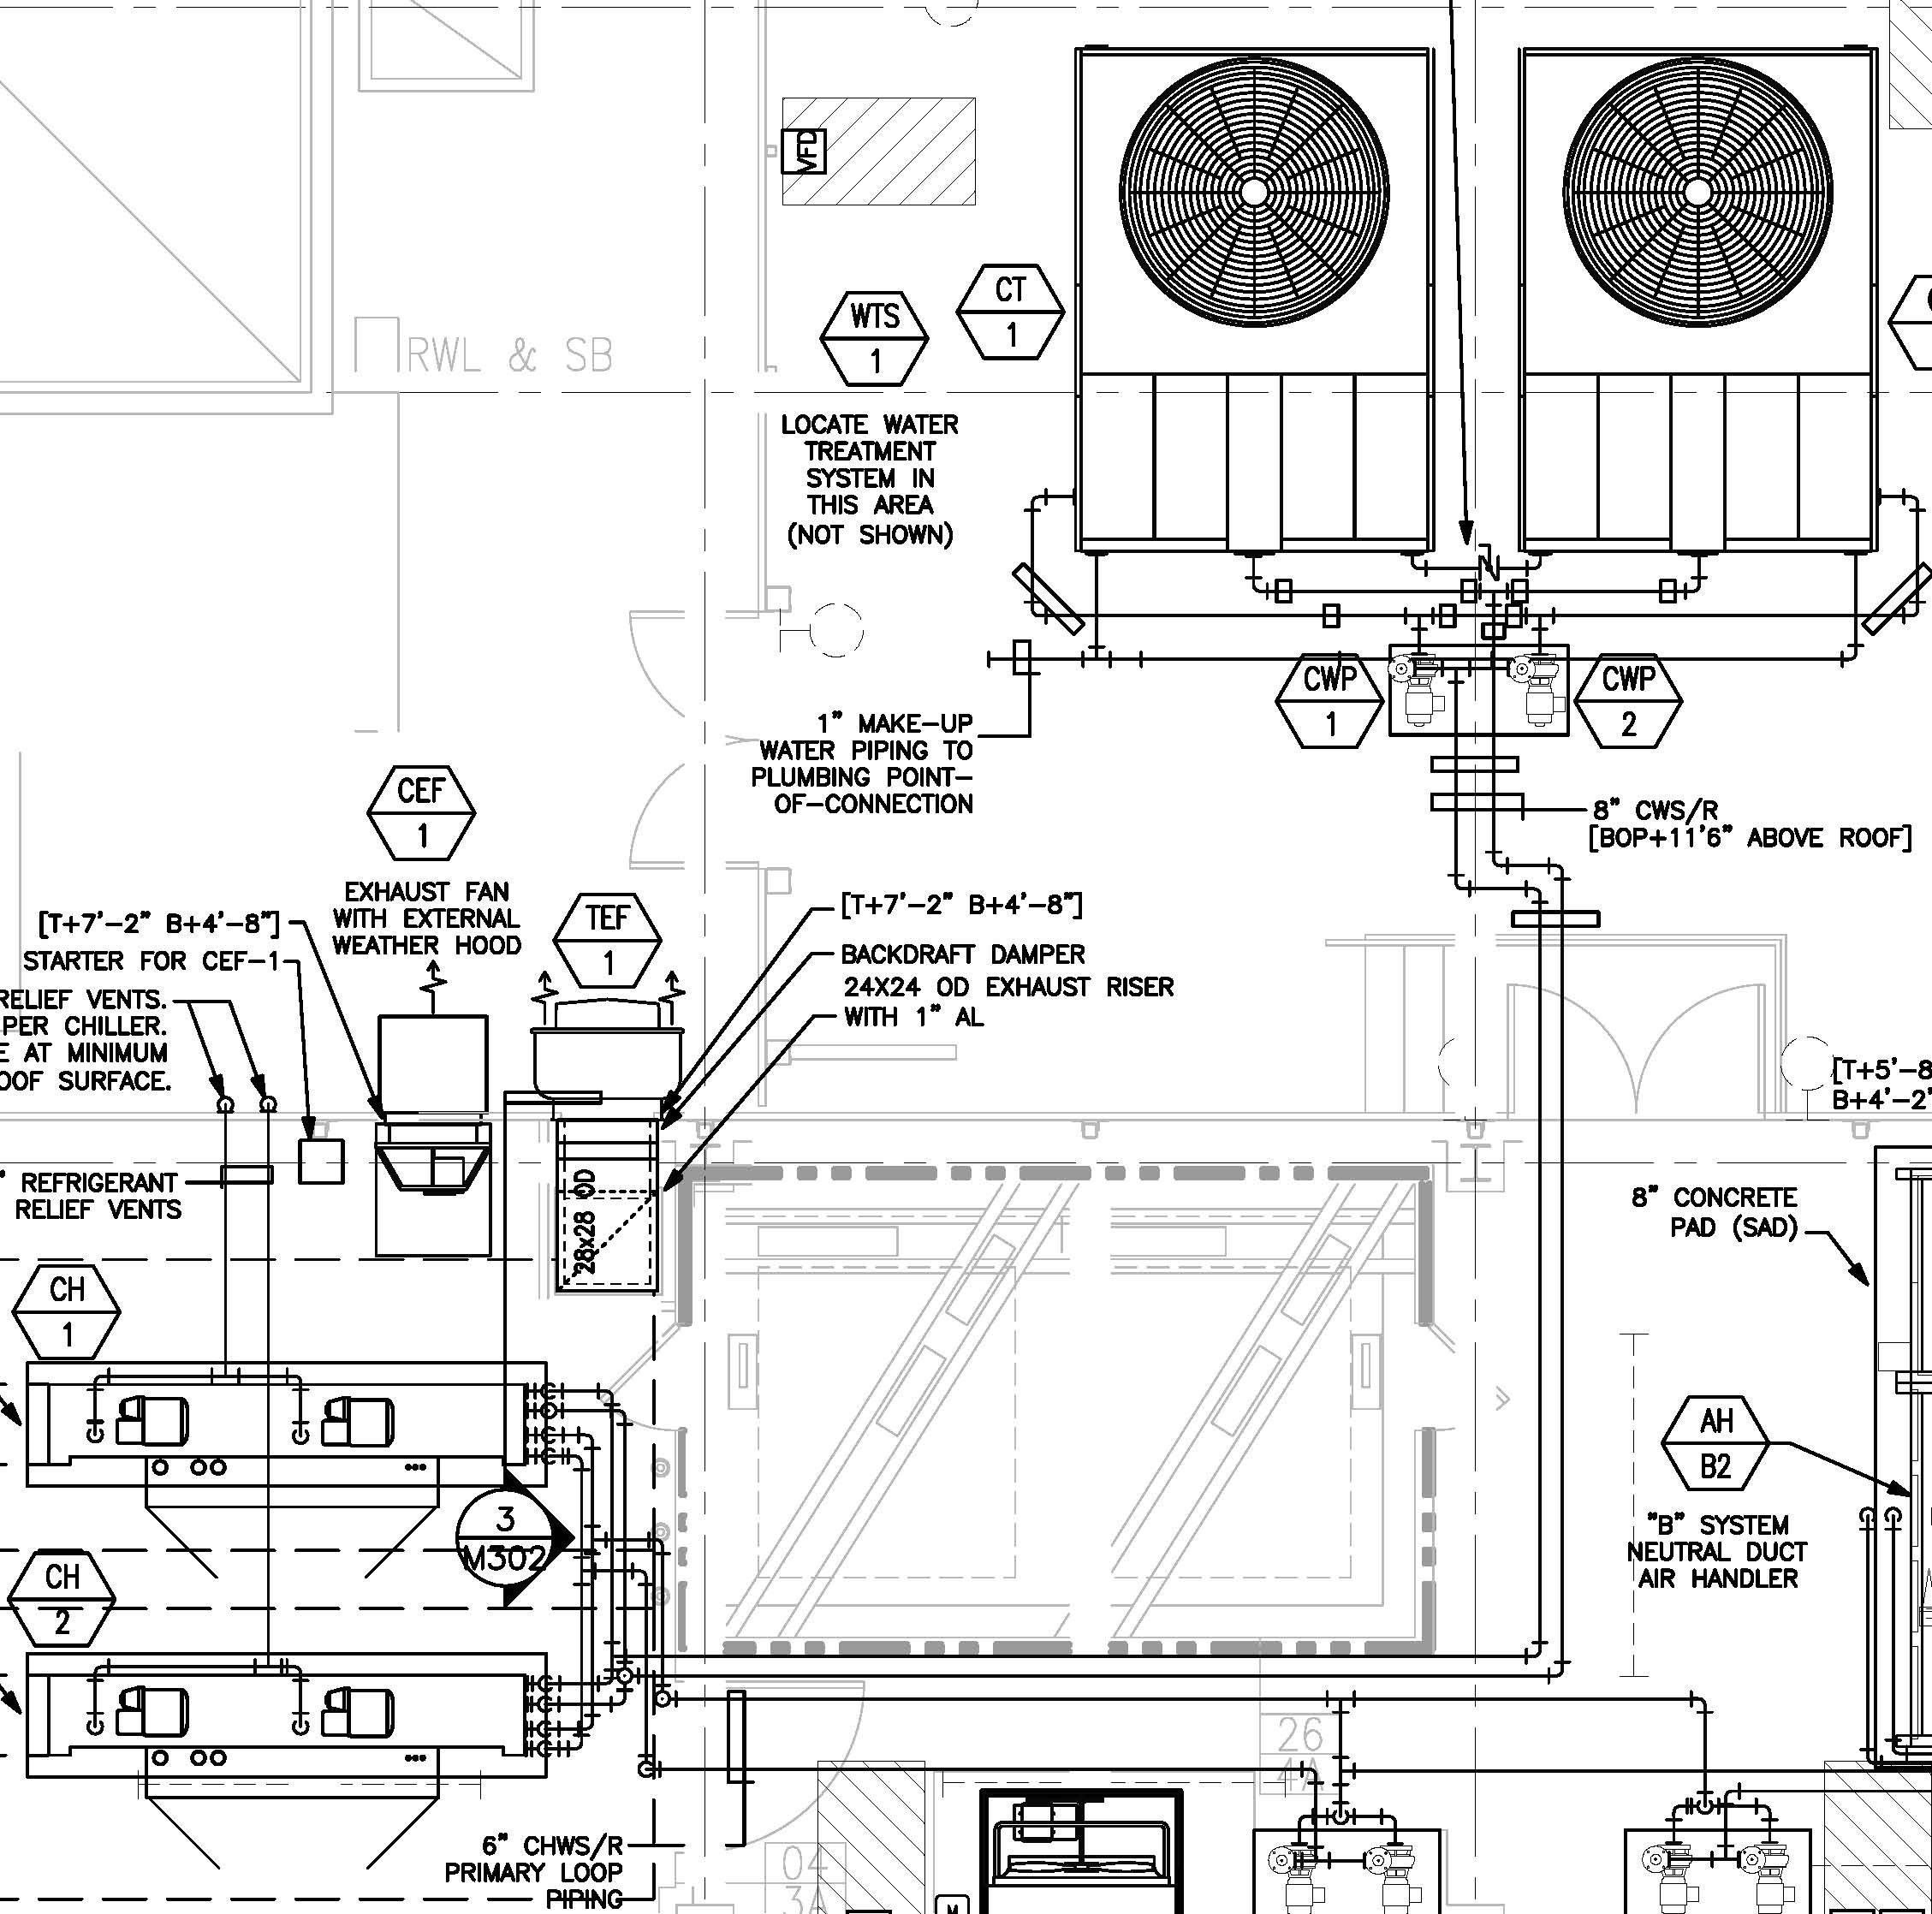 Liftmaster Wiring Diagram: Wiring Diagram Sears Garage Door Opener